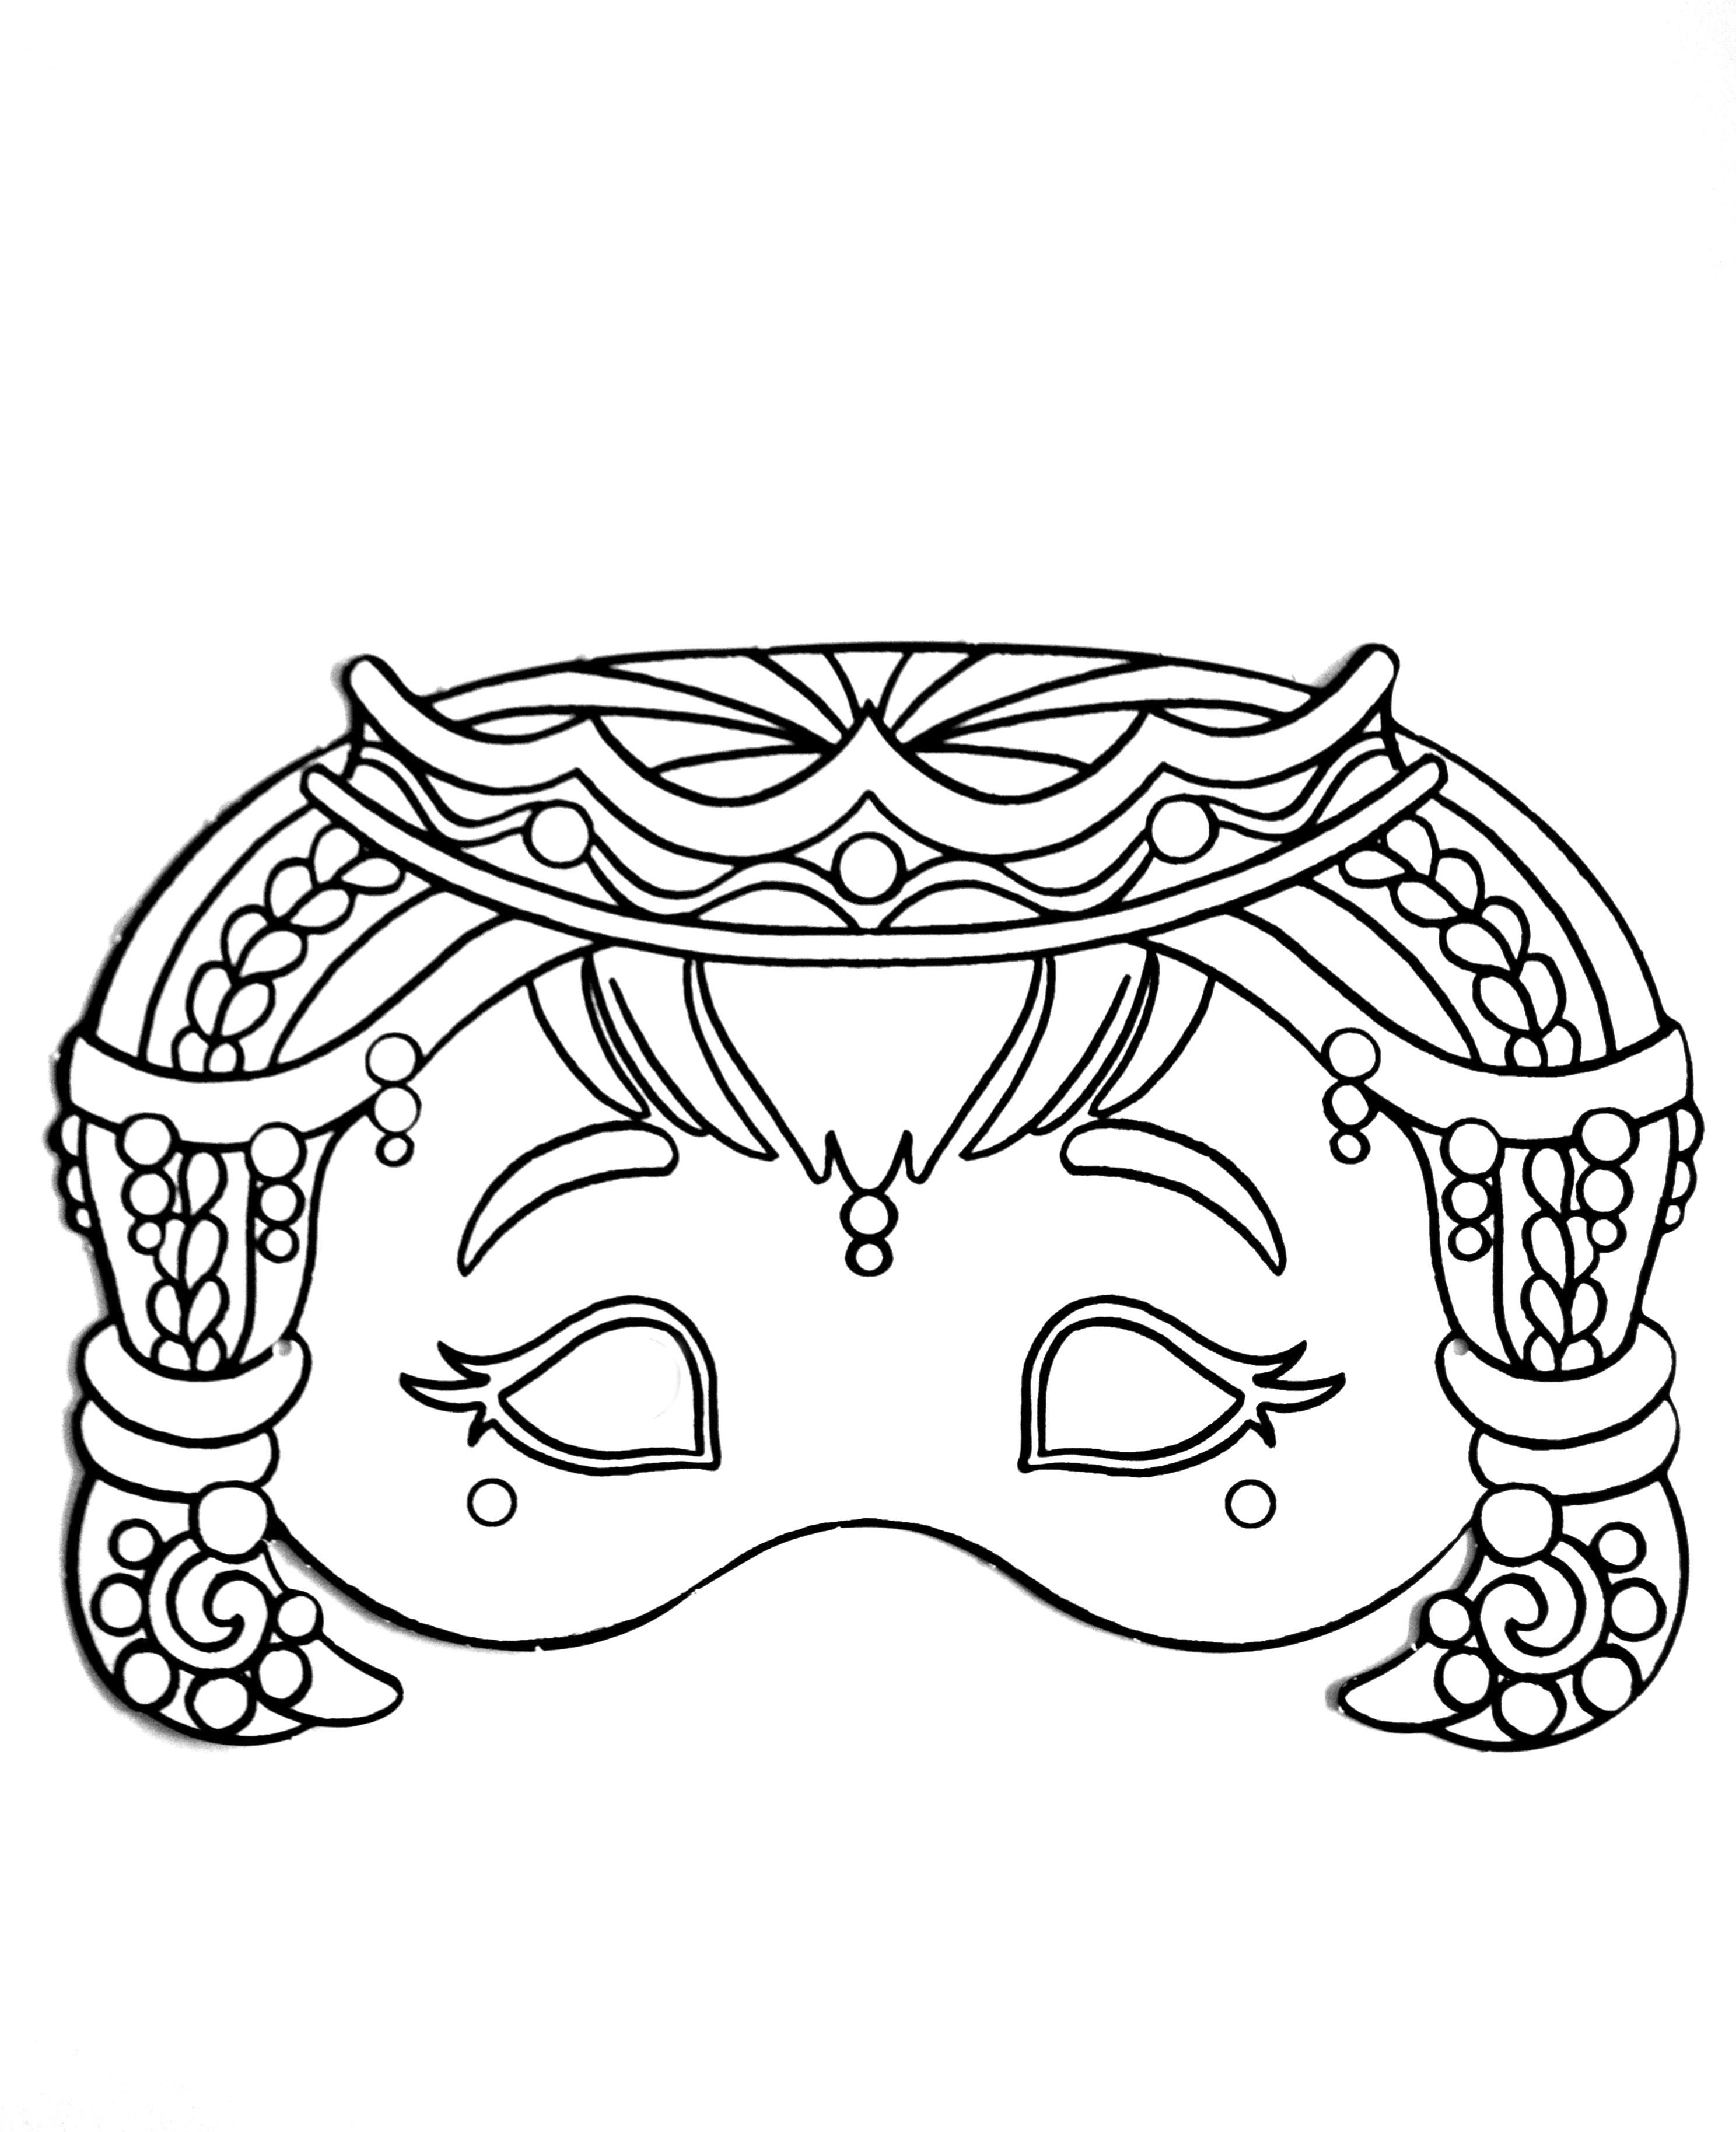 Enfants masque carnaval 1 coloriage de masques - Dessin de masque de carnaval ...